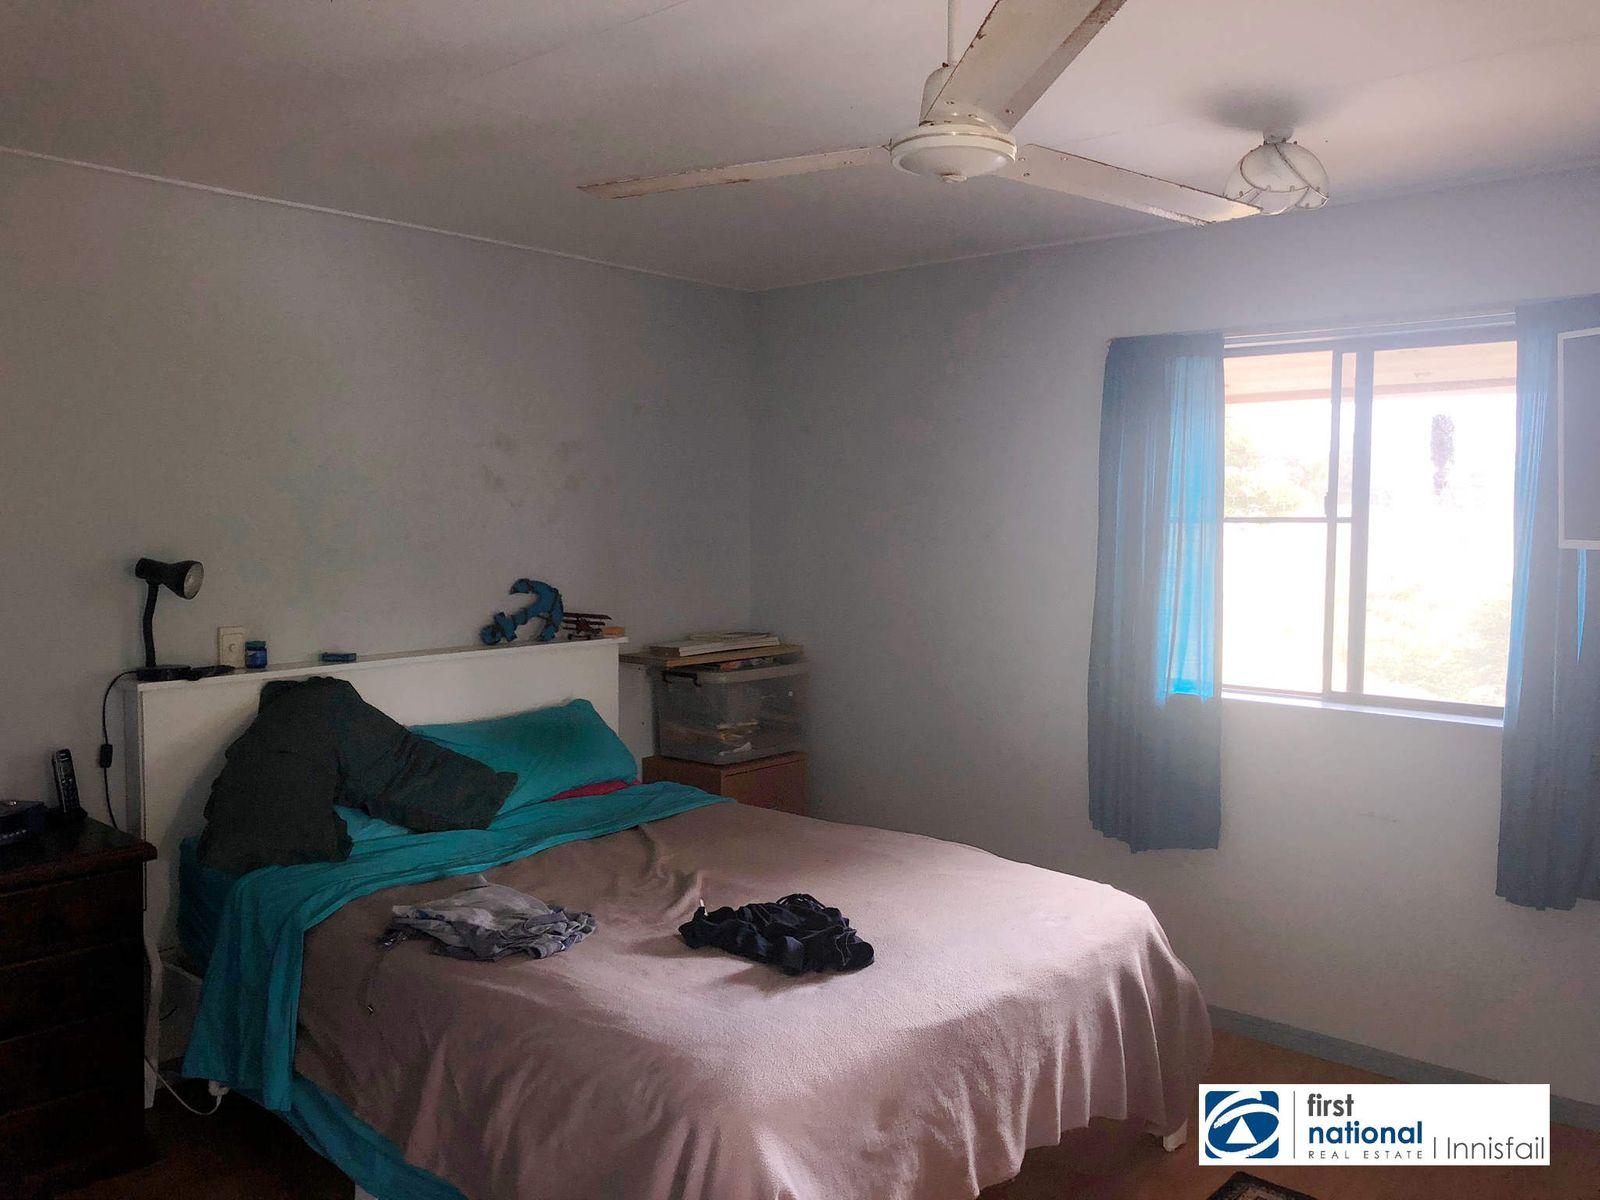 2118  PALMERSTON HIGHWAY, East Palmerston, QLD 4860